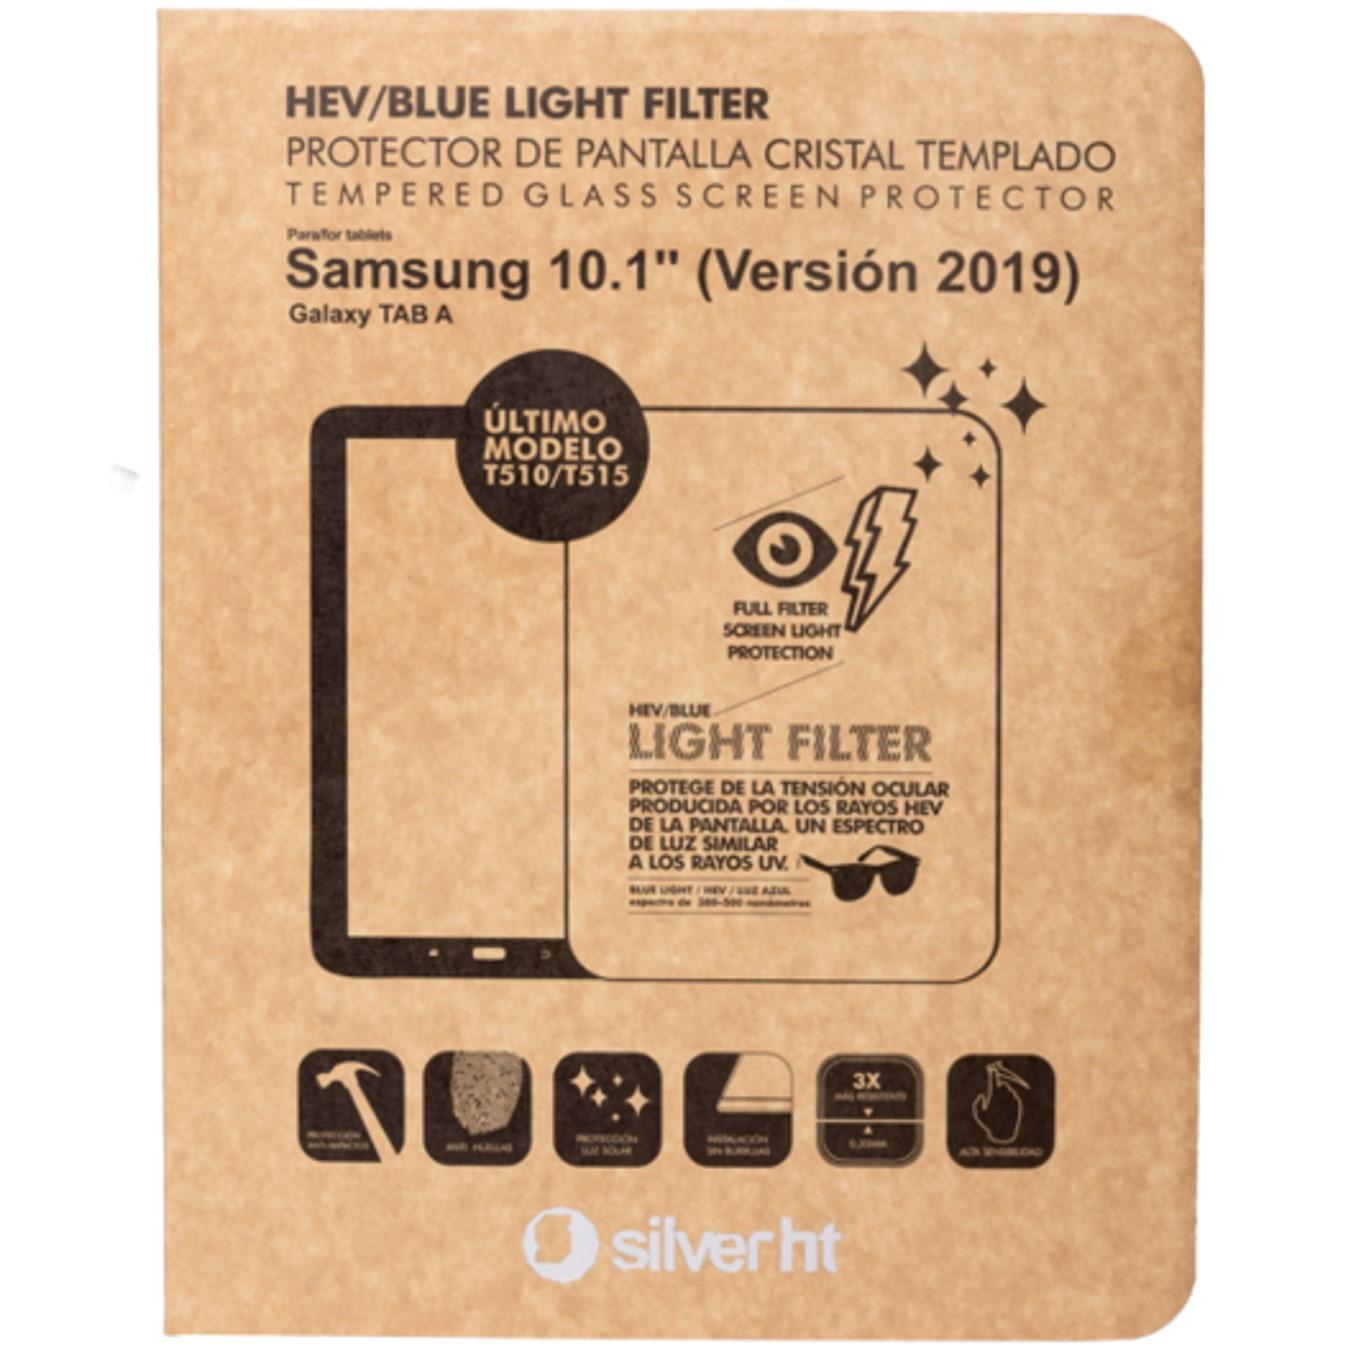 Protector de pantalla silver ht para samsung tab a 2019 10.1pulgadas (t510 - t515) cristal templado blue light